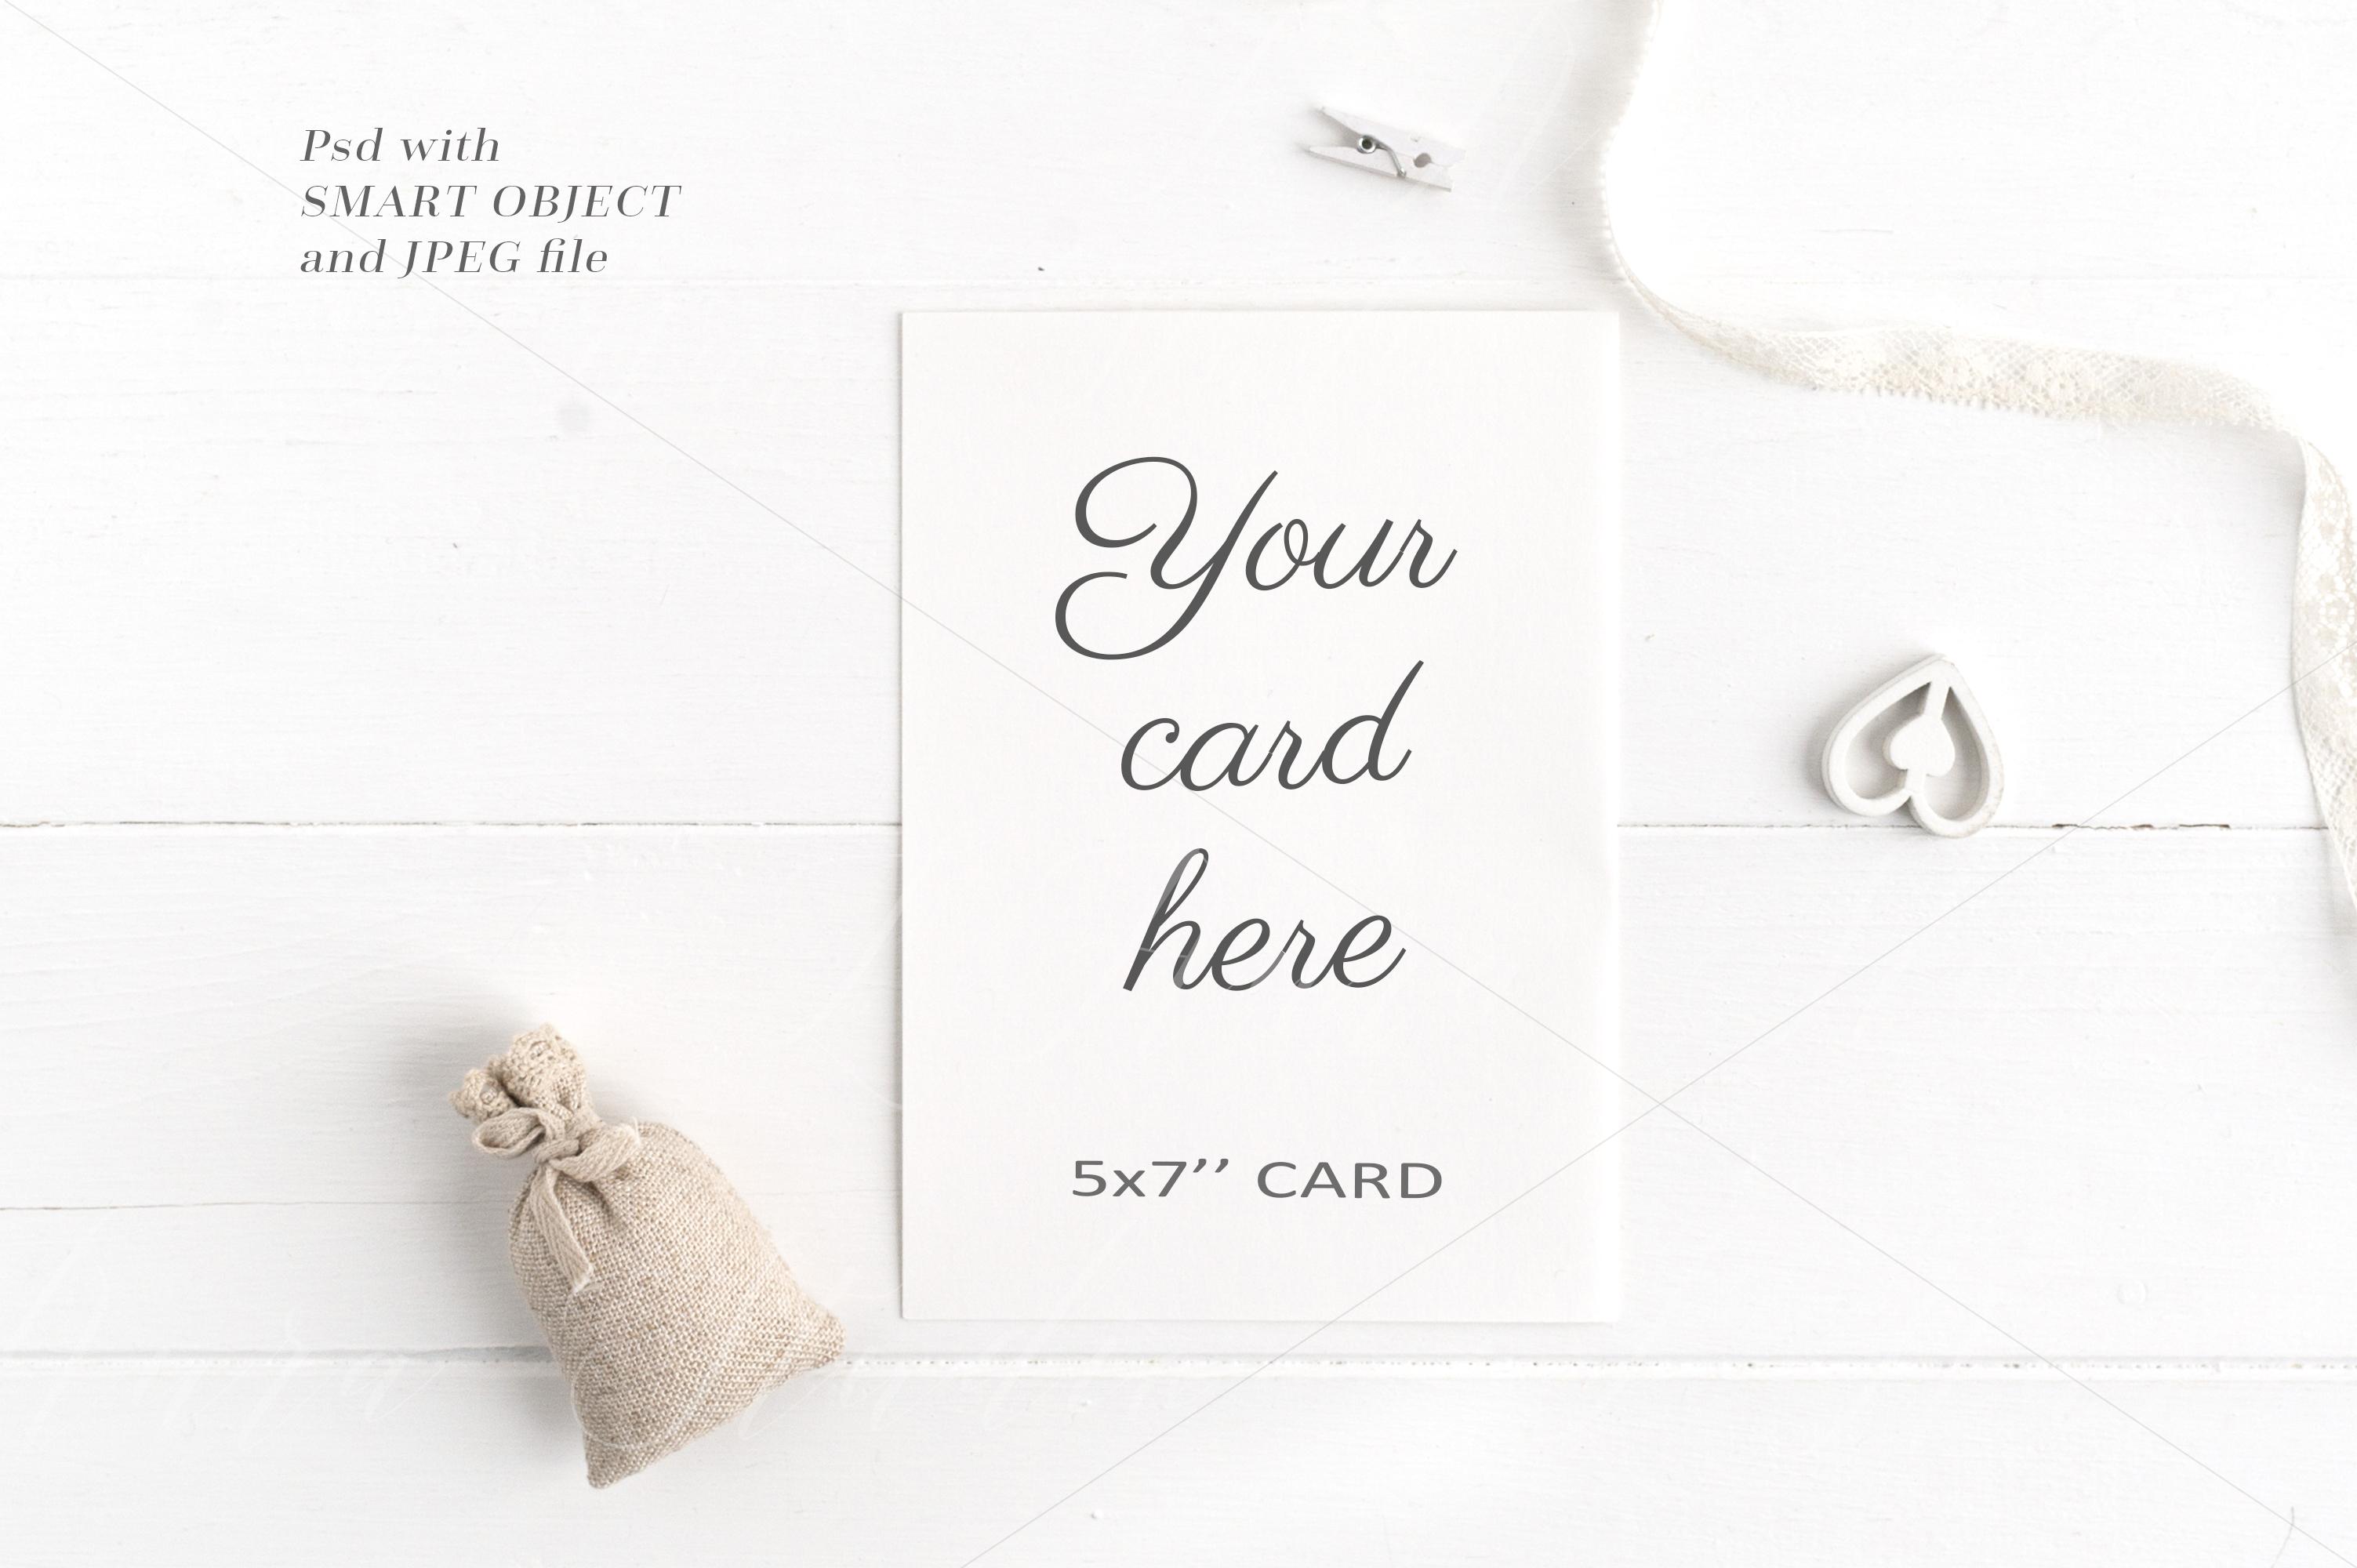 Wedding 5x7 Card Mockup - crd210 example image 1